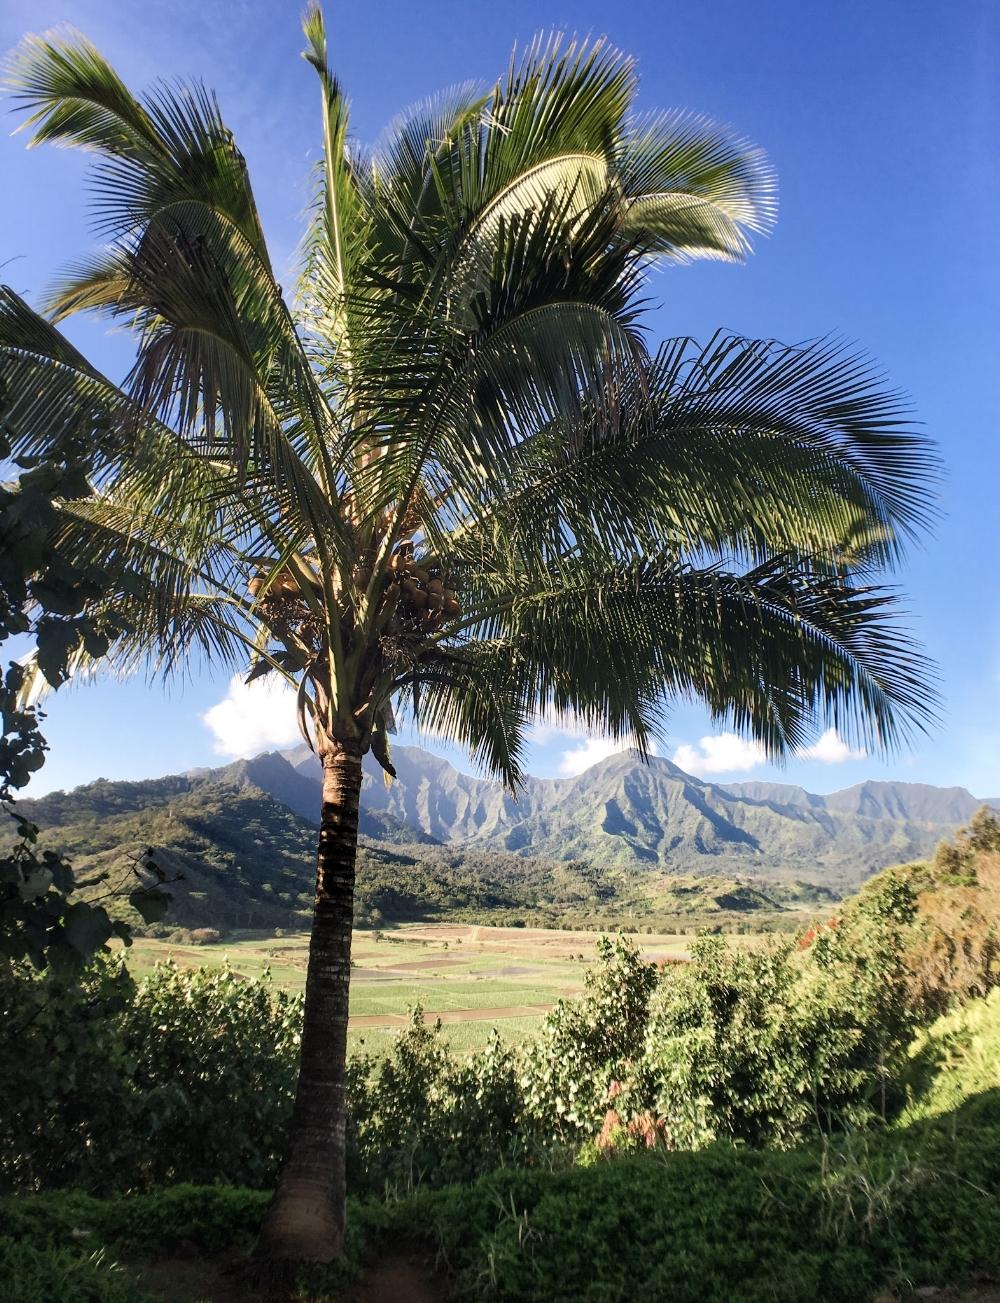 curio.trips.hawaii.kauai.view.jpg